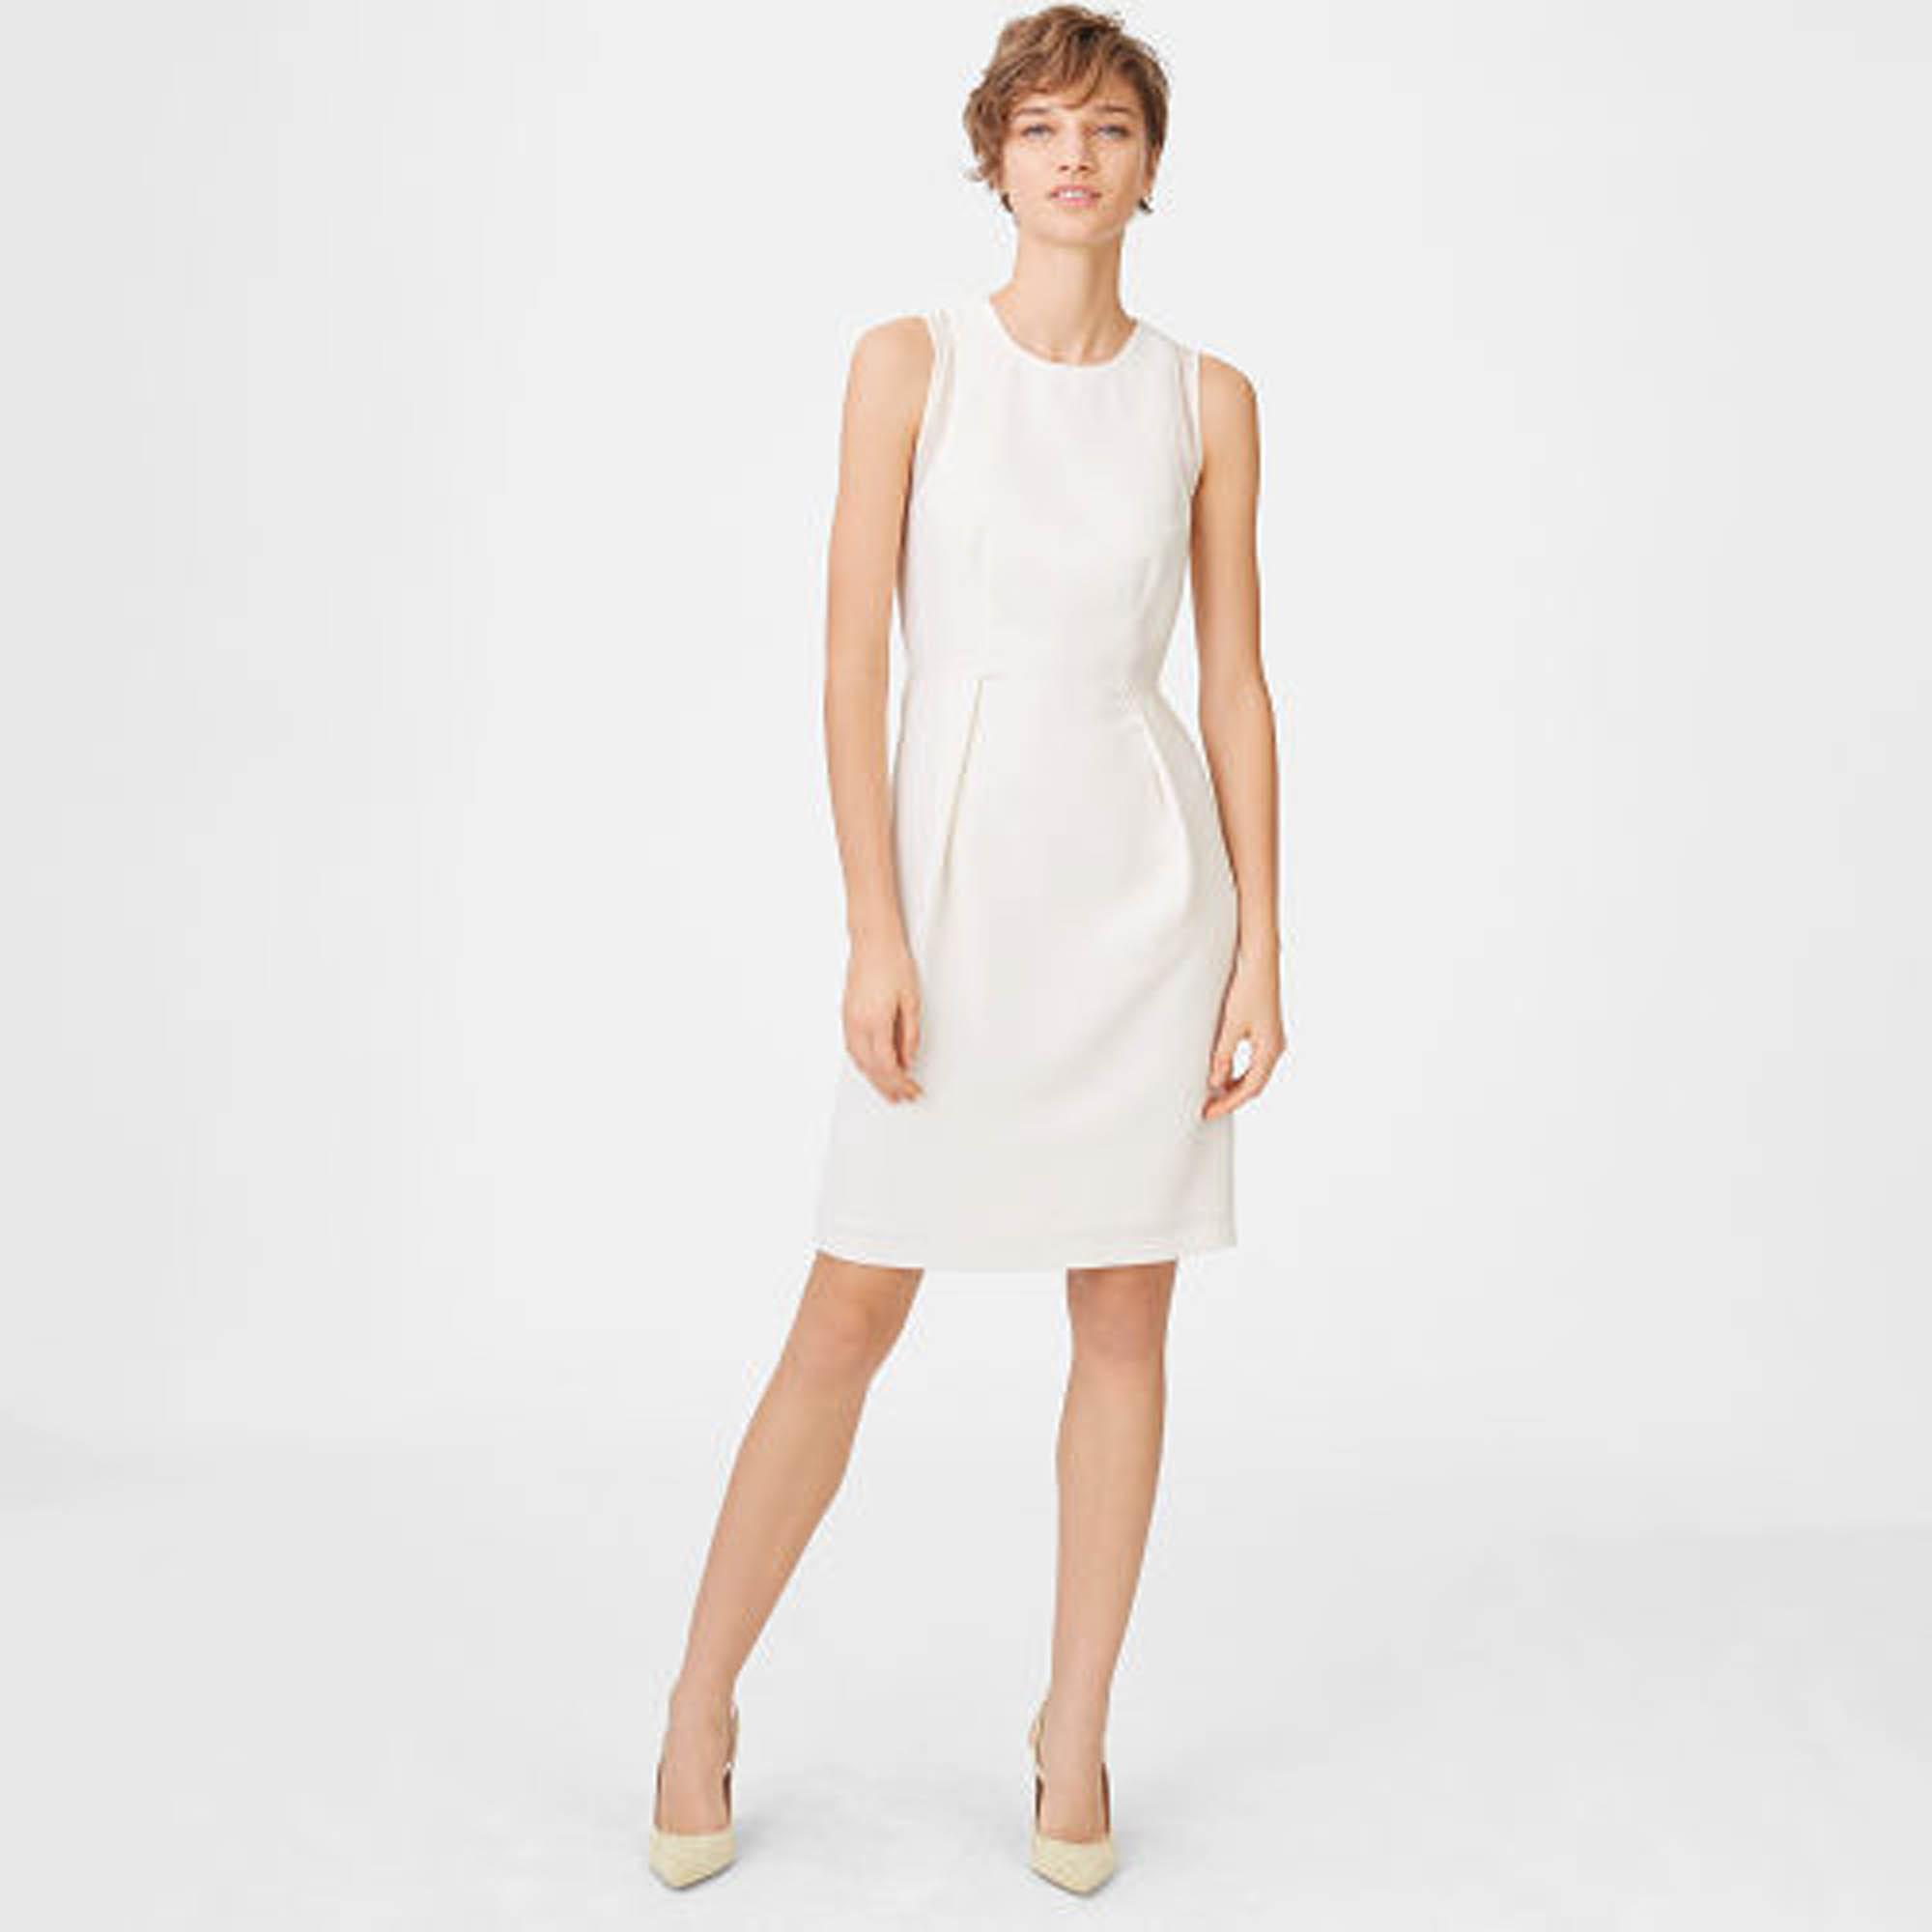 Ohwen Dress   HK$2,090